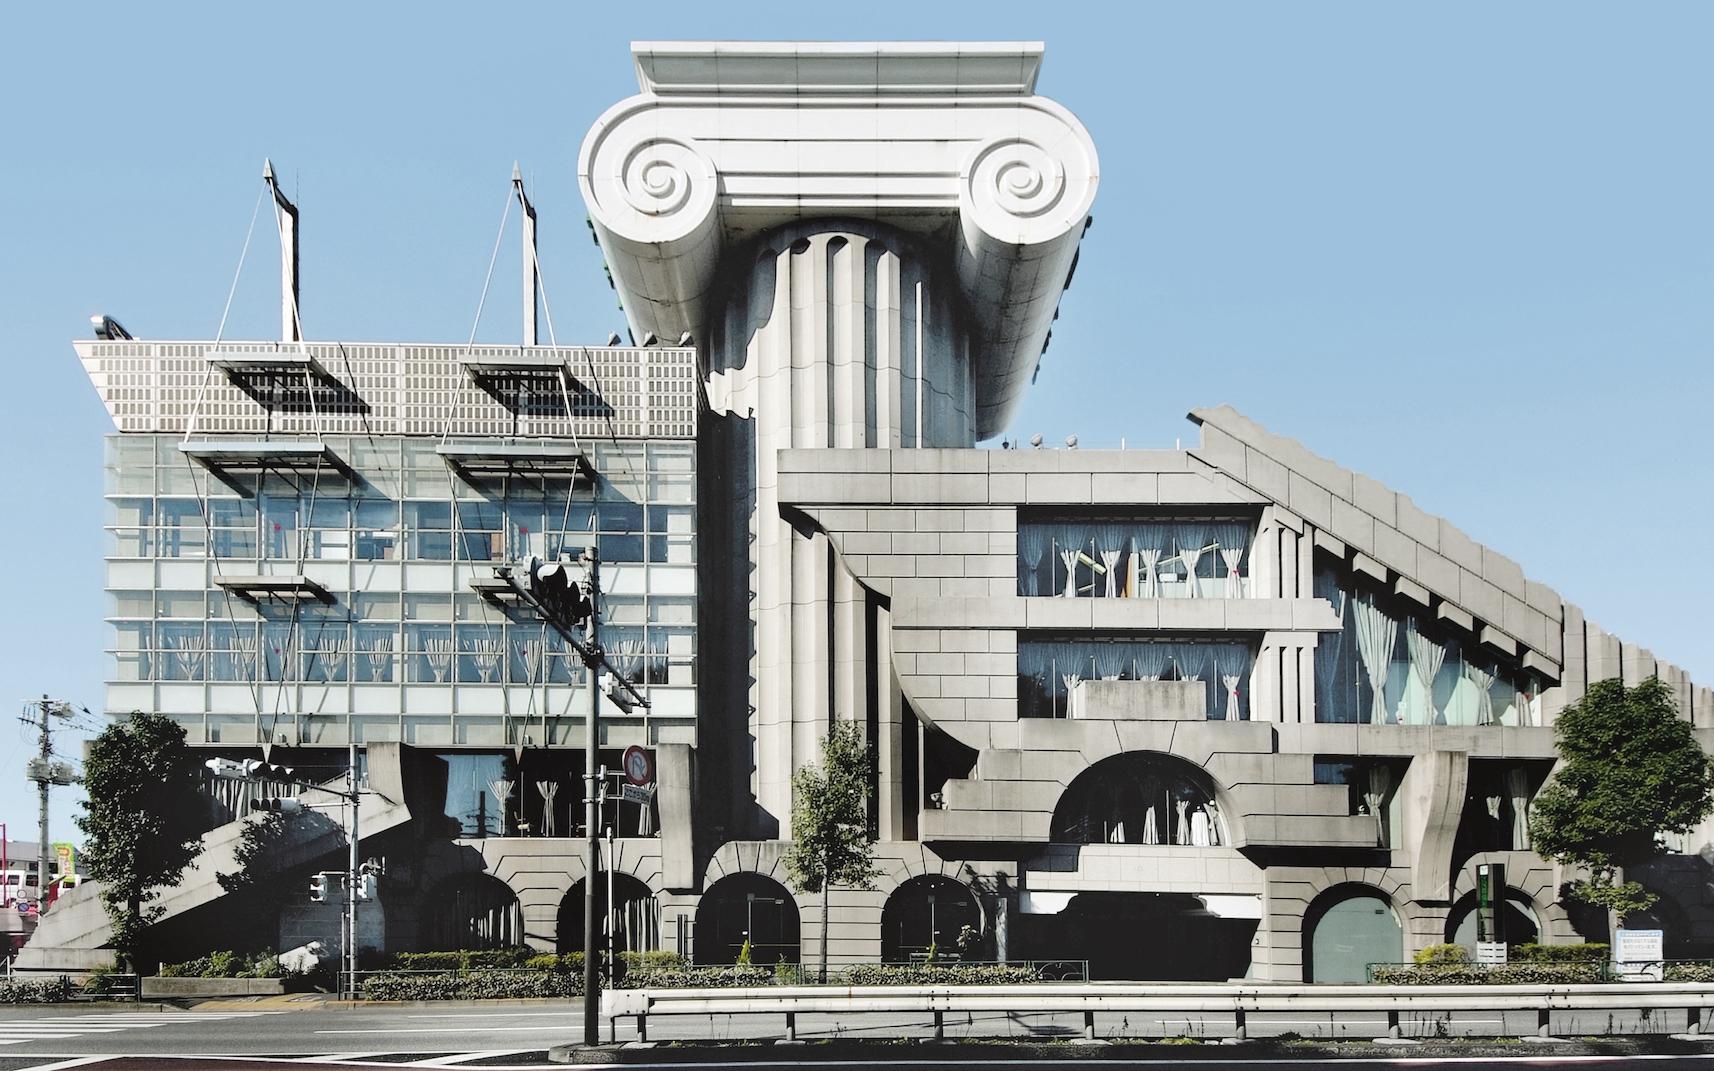 042 M2 Building